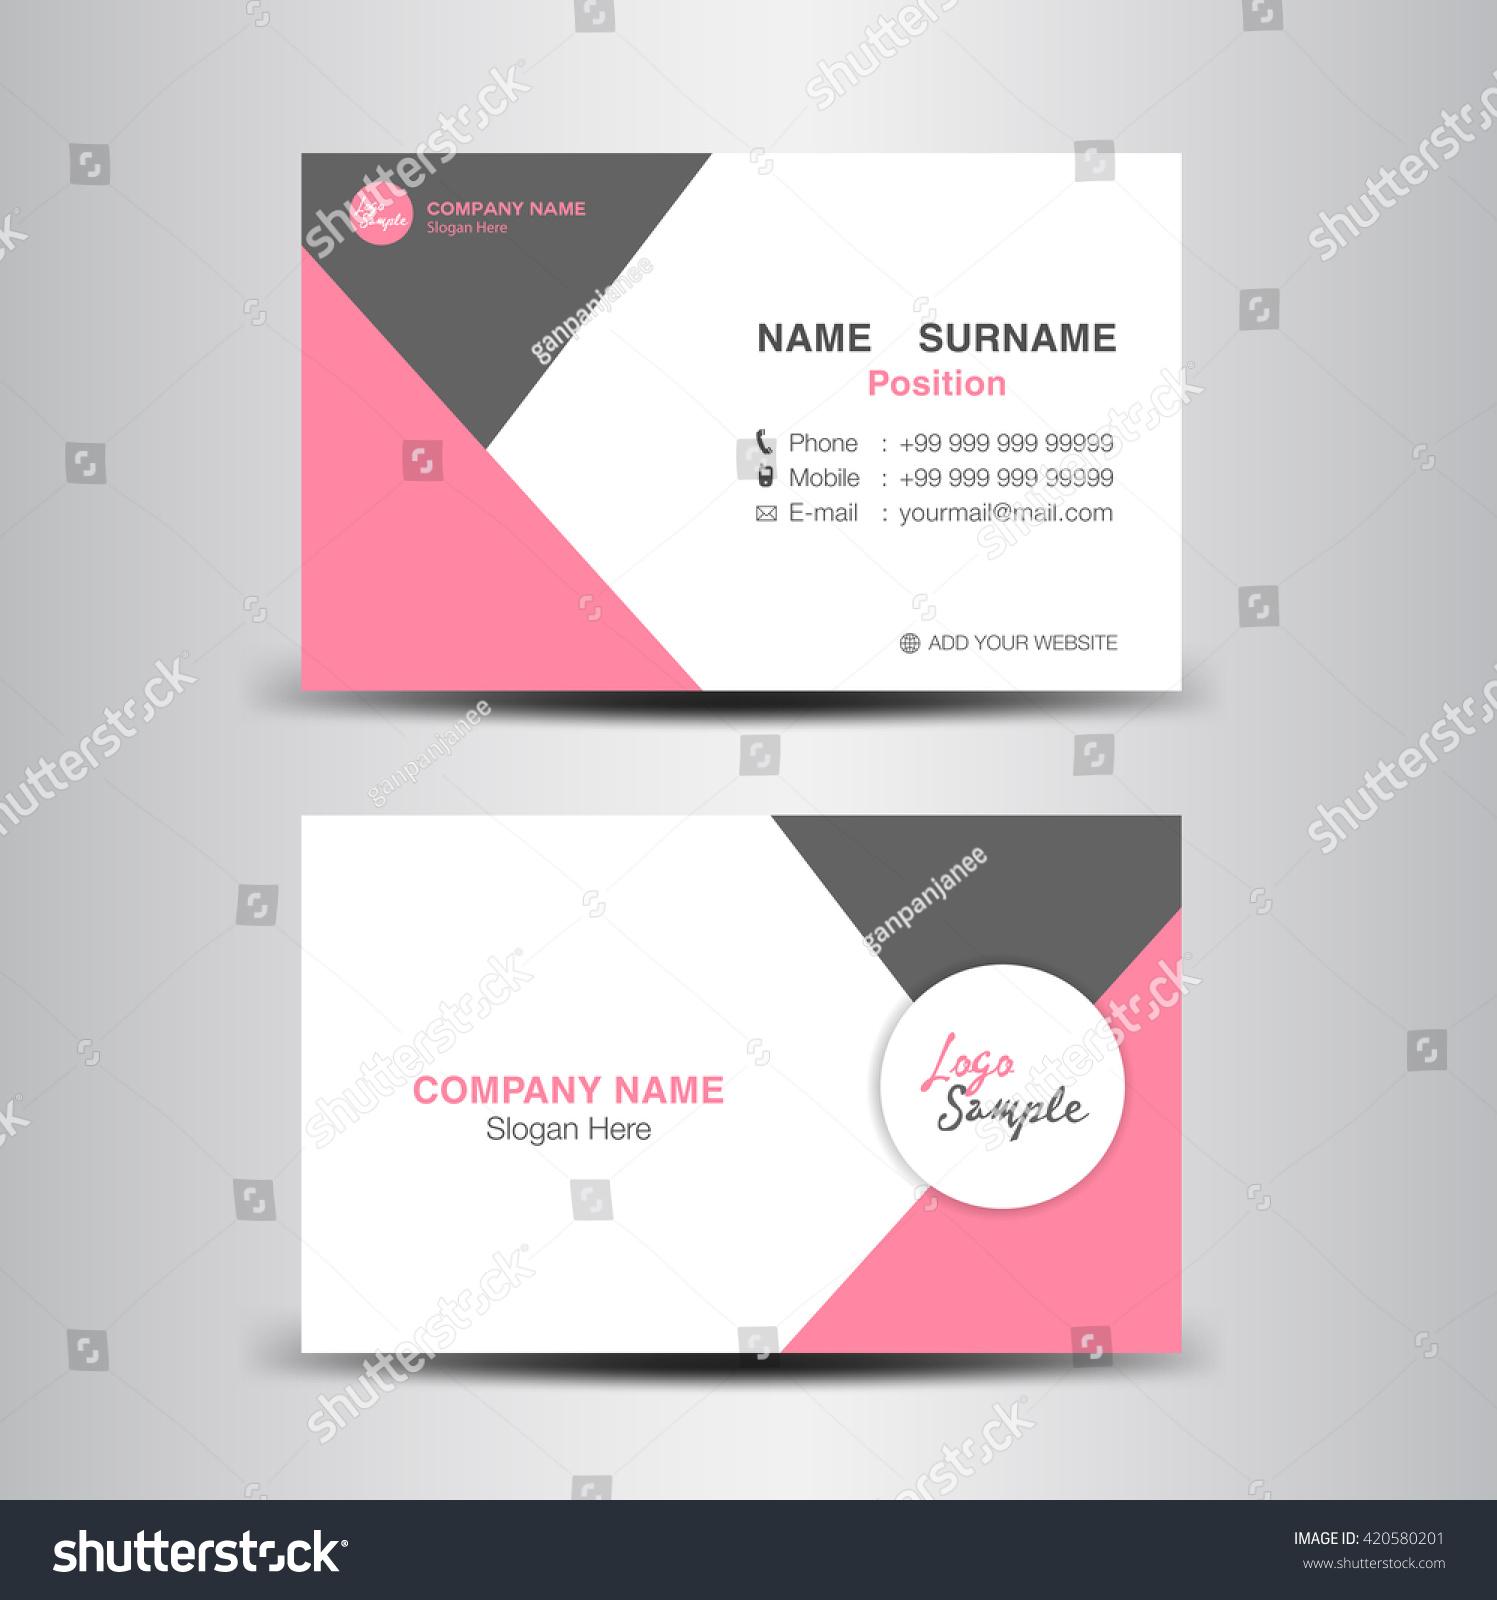 creative clean business card templateflyer designpink stock vector creative and clean business card template flyer design pink polygon background card